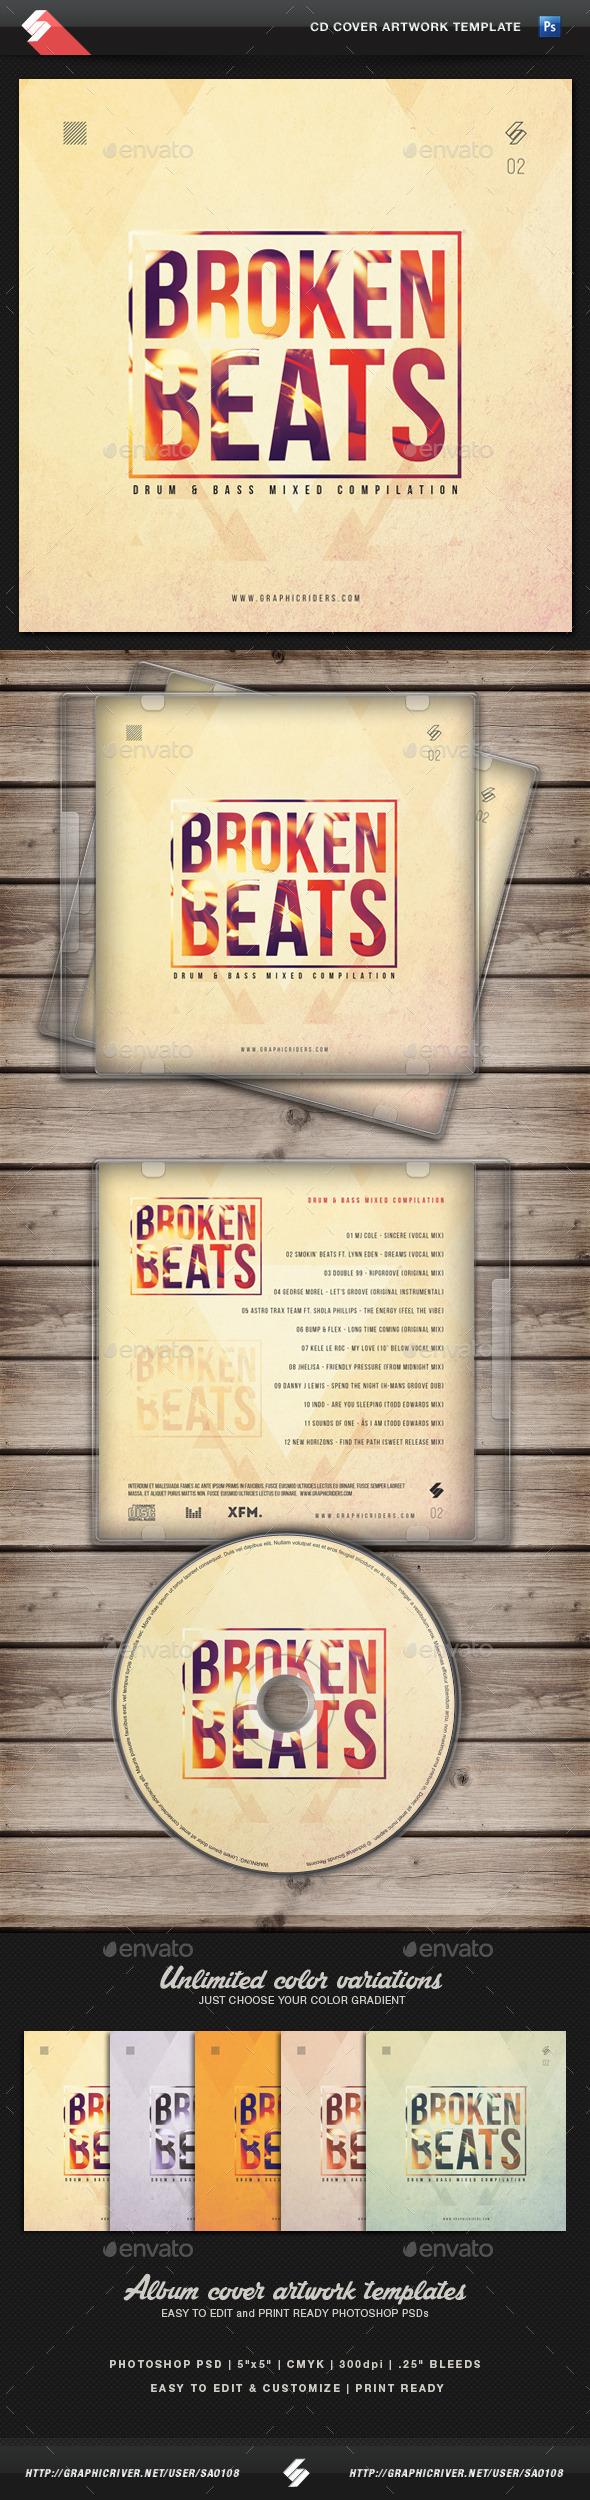 Broken Beats Vol2 CD Cover Artwork Template